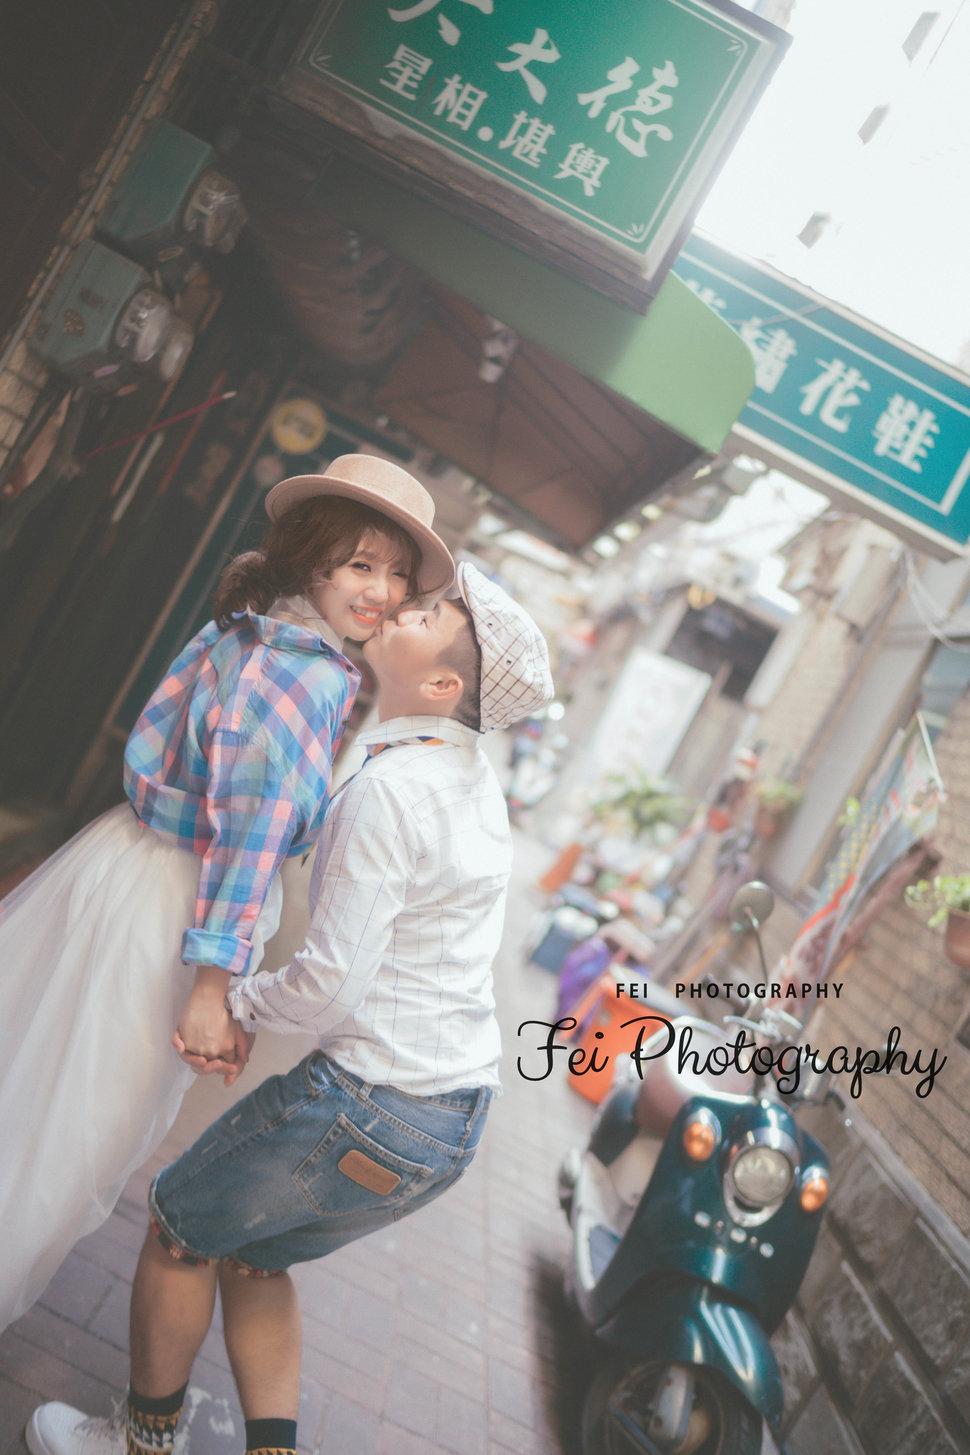 44 - 飛妃 Photography/女攝影師《結婚吧》